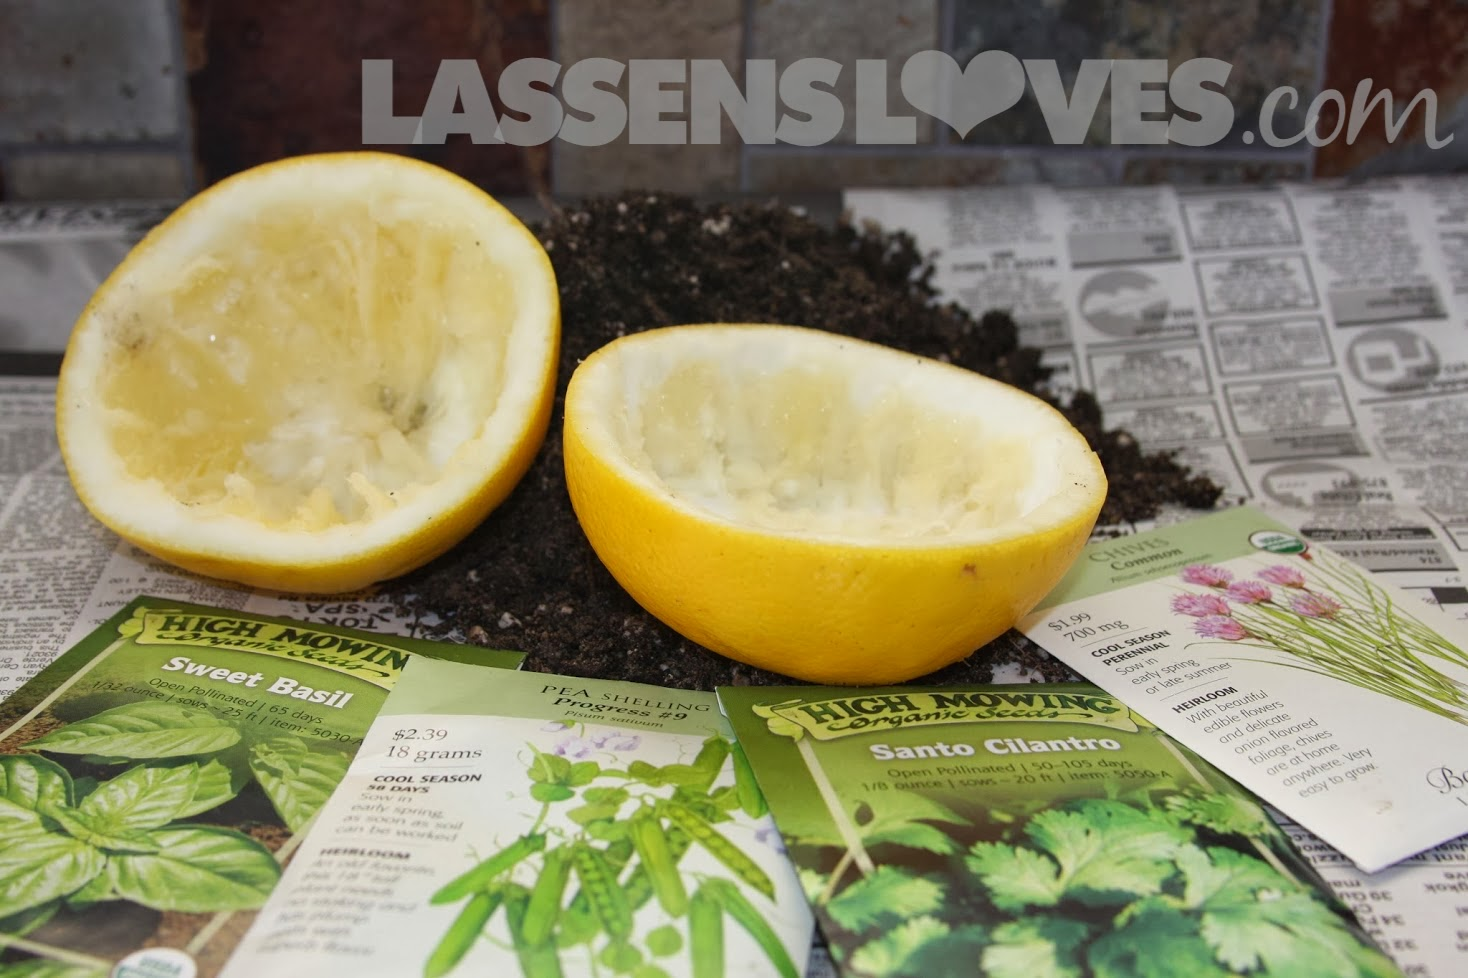 grapefruit+rind+garden